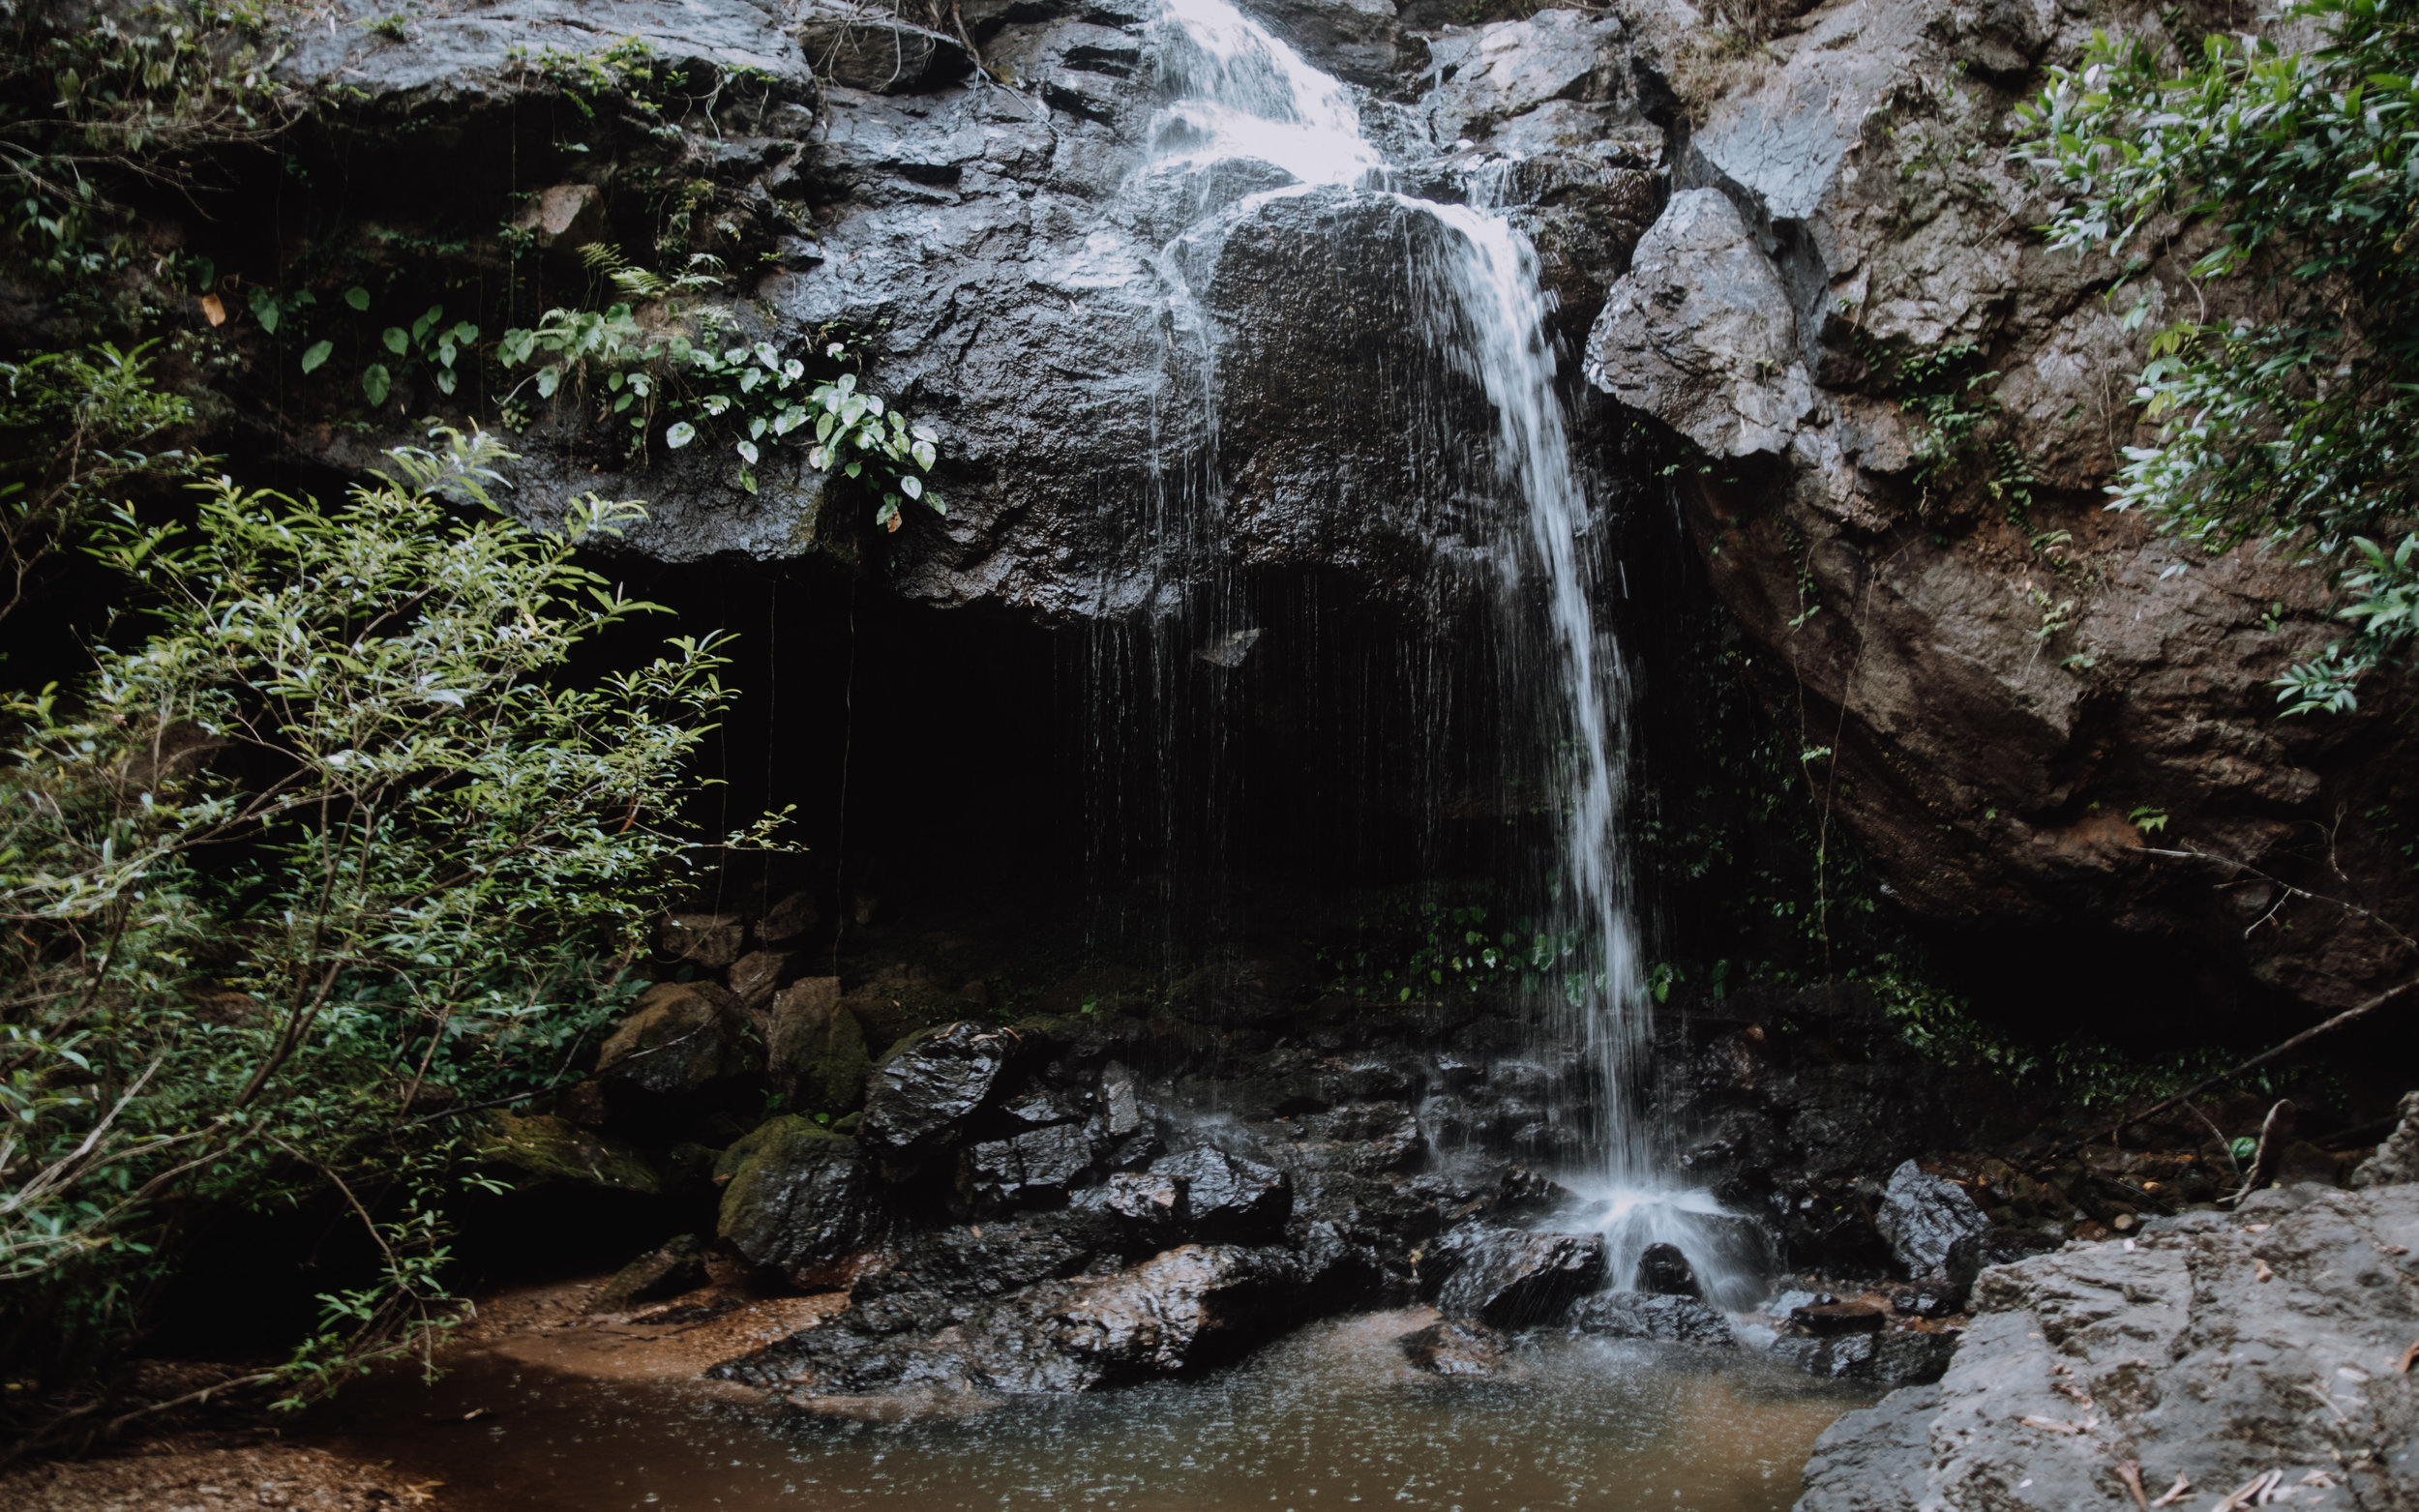 Waterfall at Khun Phawo National Park